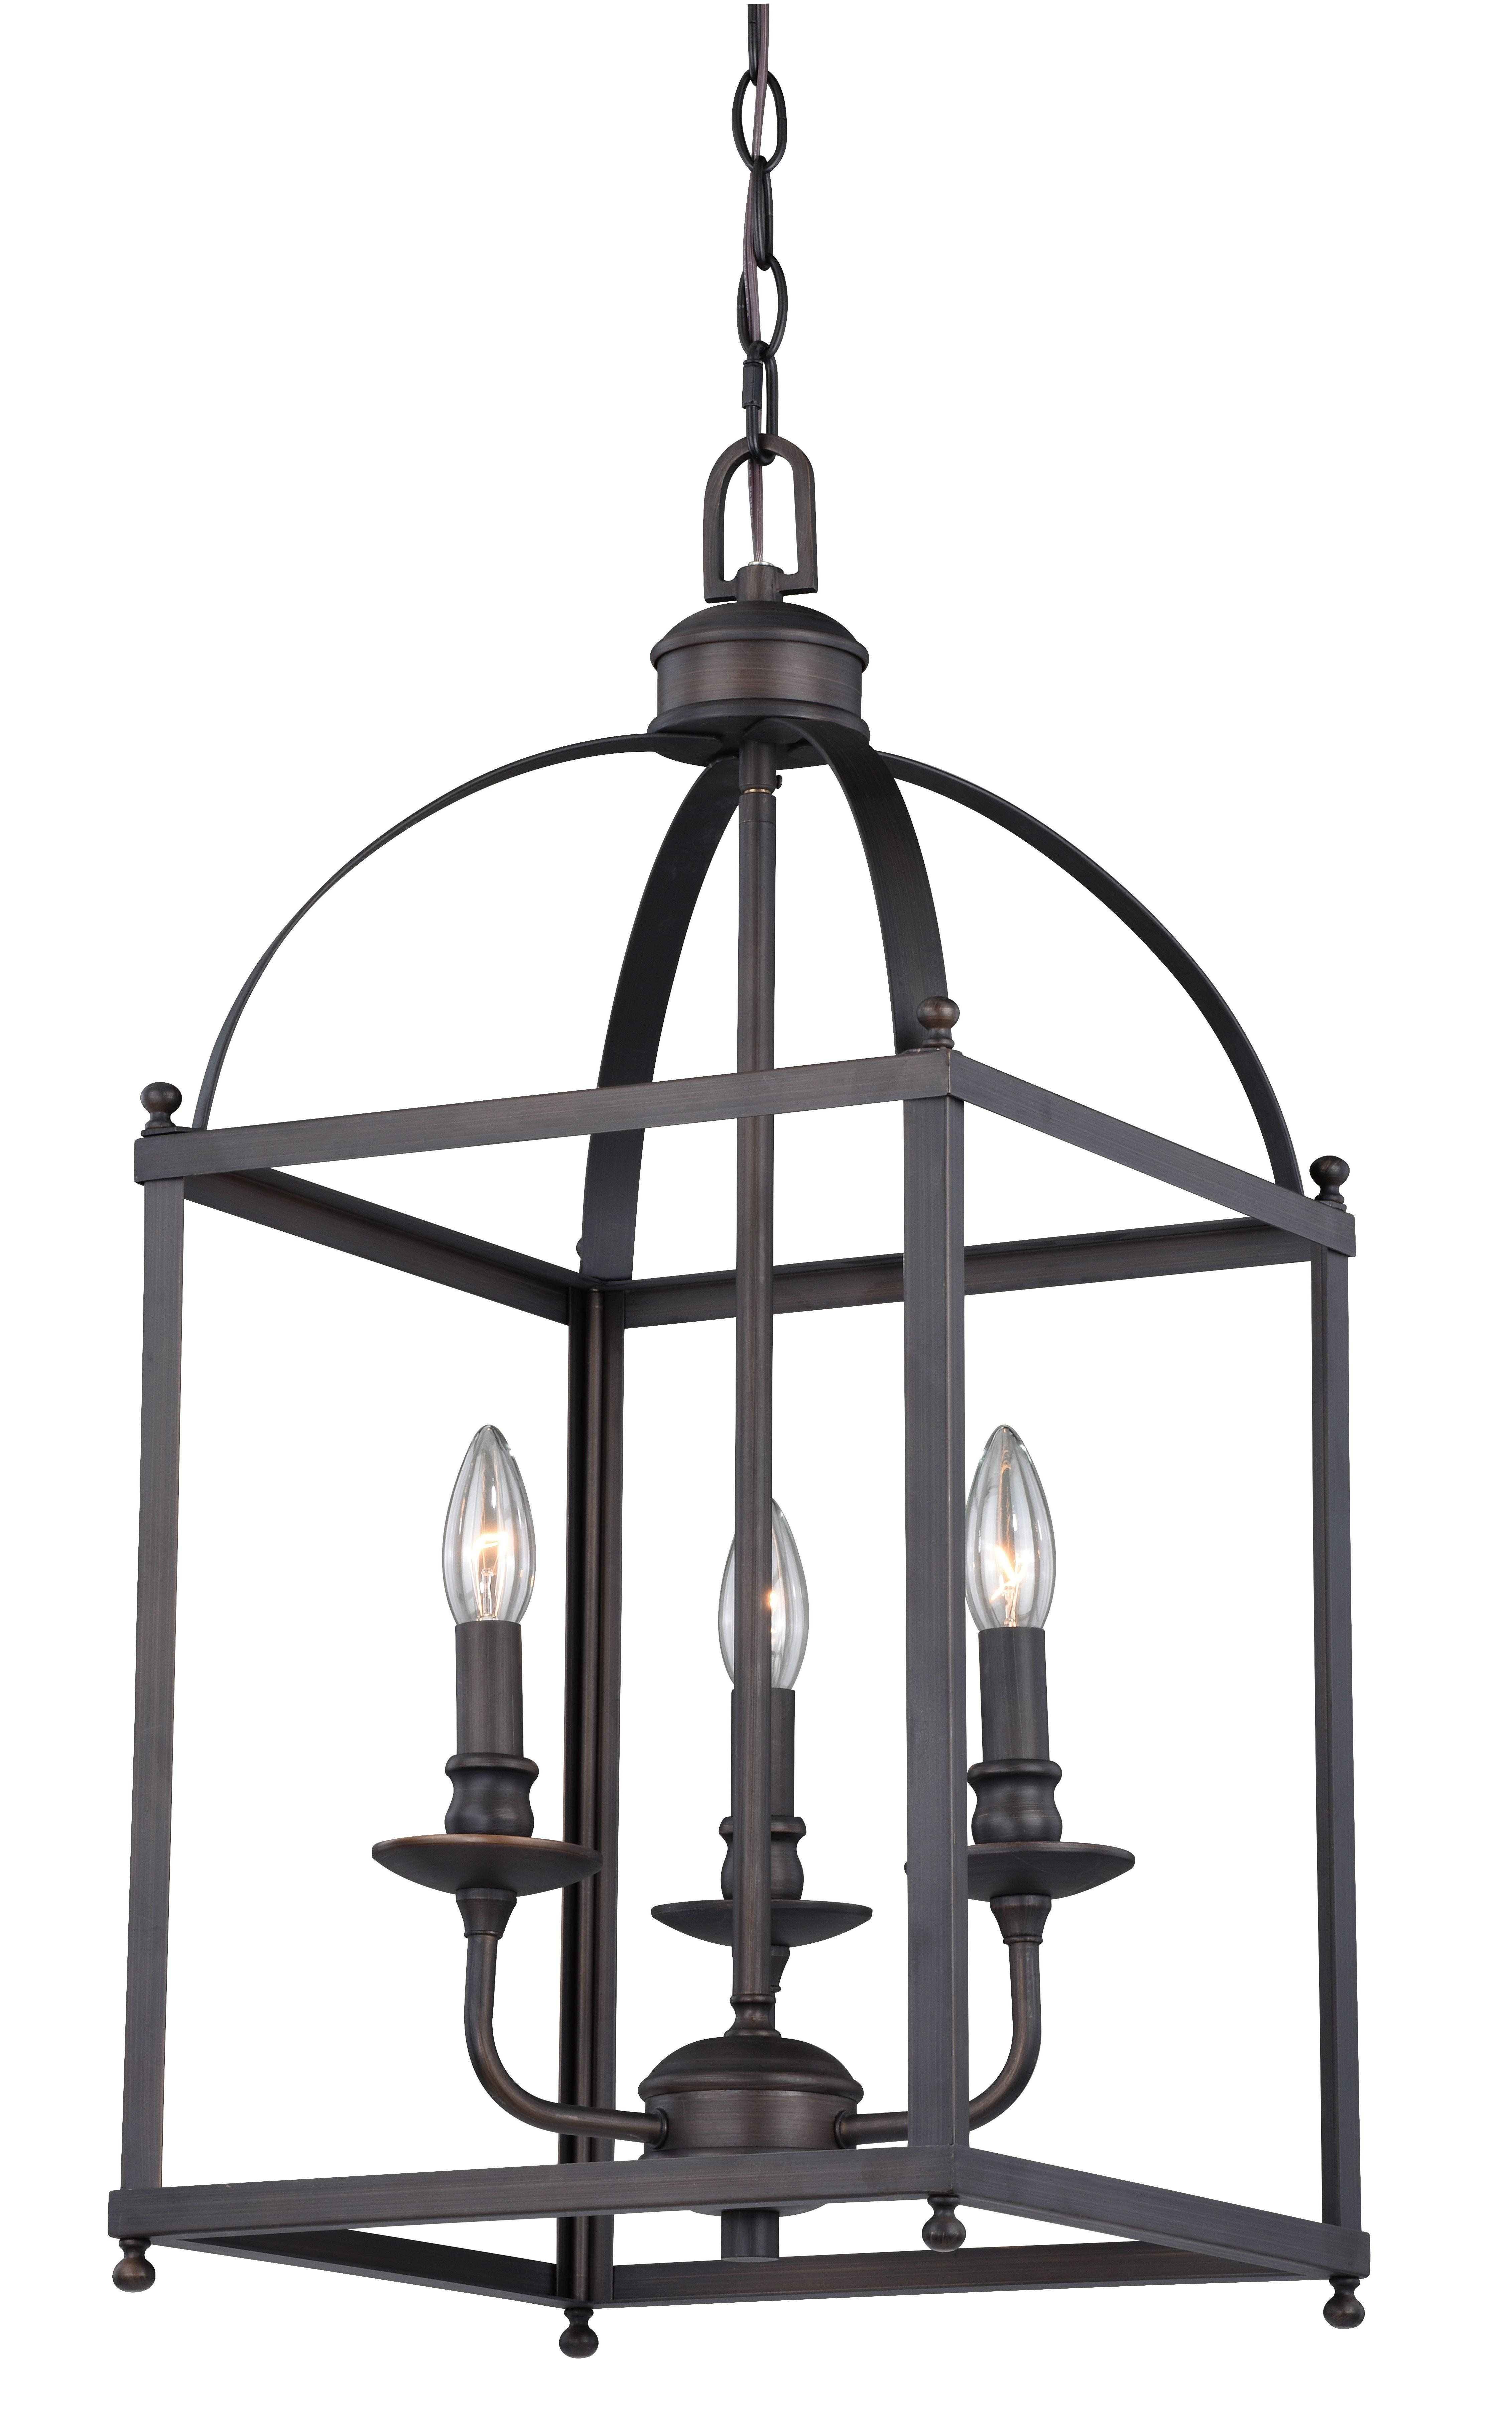 Fashionable Cleona Modern 3 Light Foyer Pendant Regarding Leiters 3 Light Lantern Geometric Pendants (View 15 of 25)